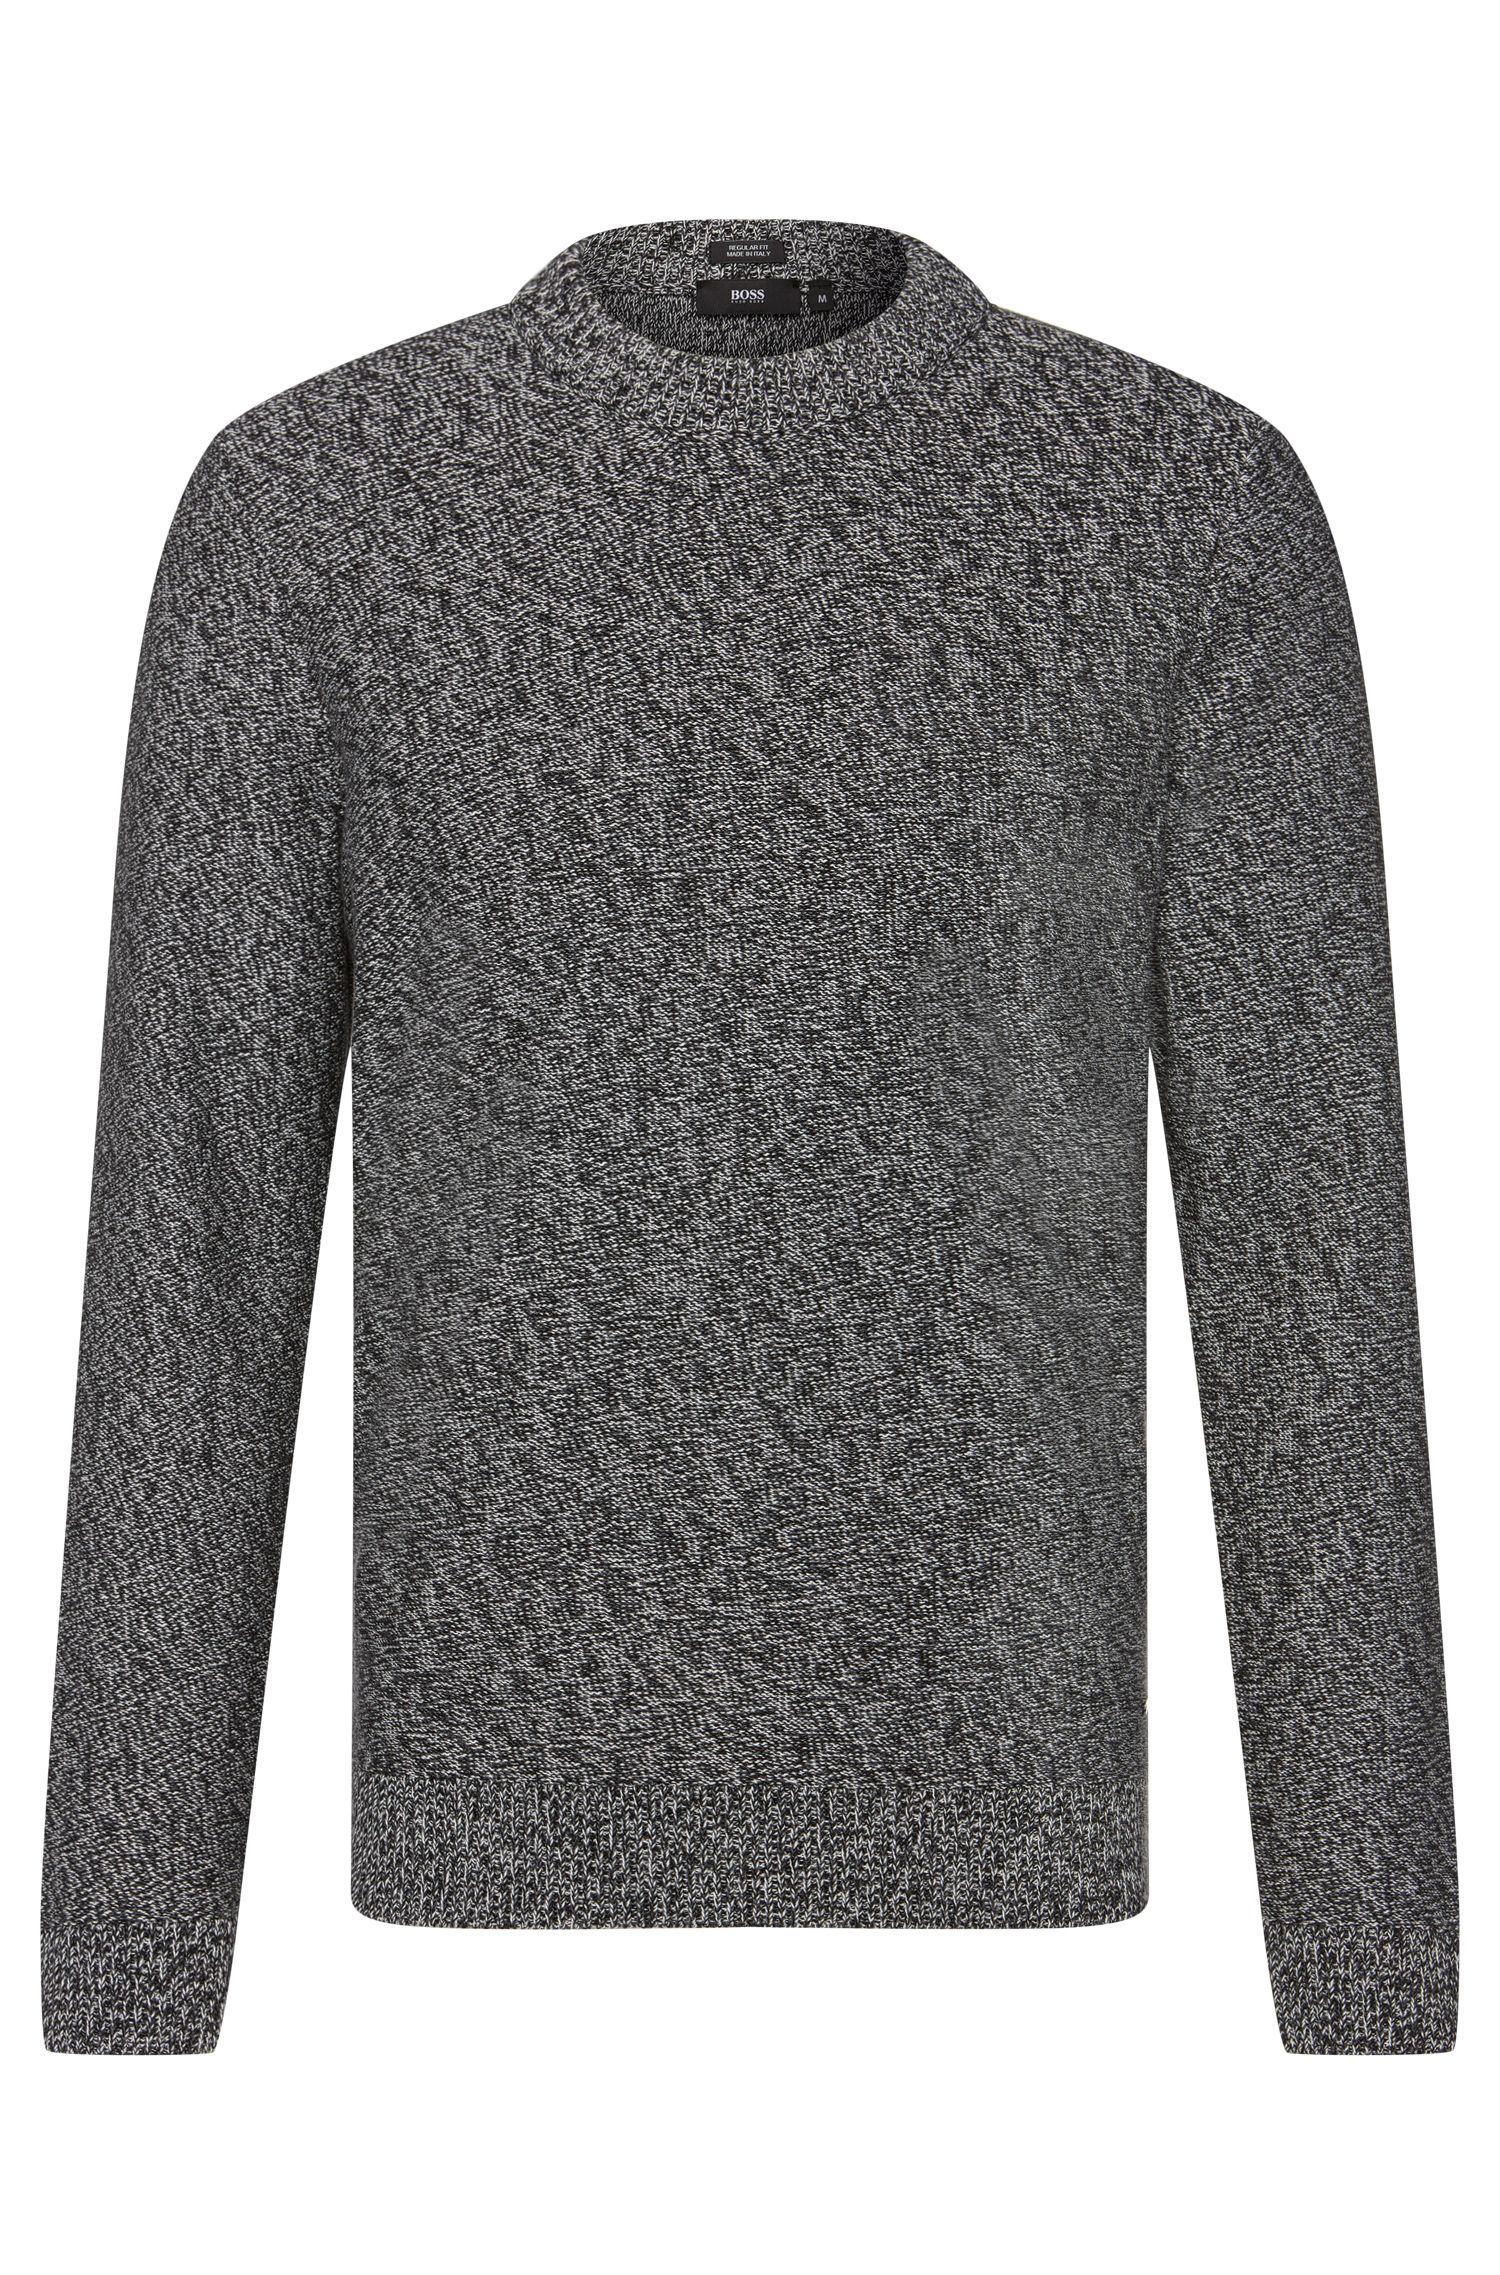 'Igus'   Italian Mouline Cotton Melange Sweater